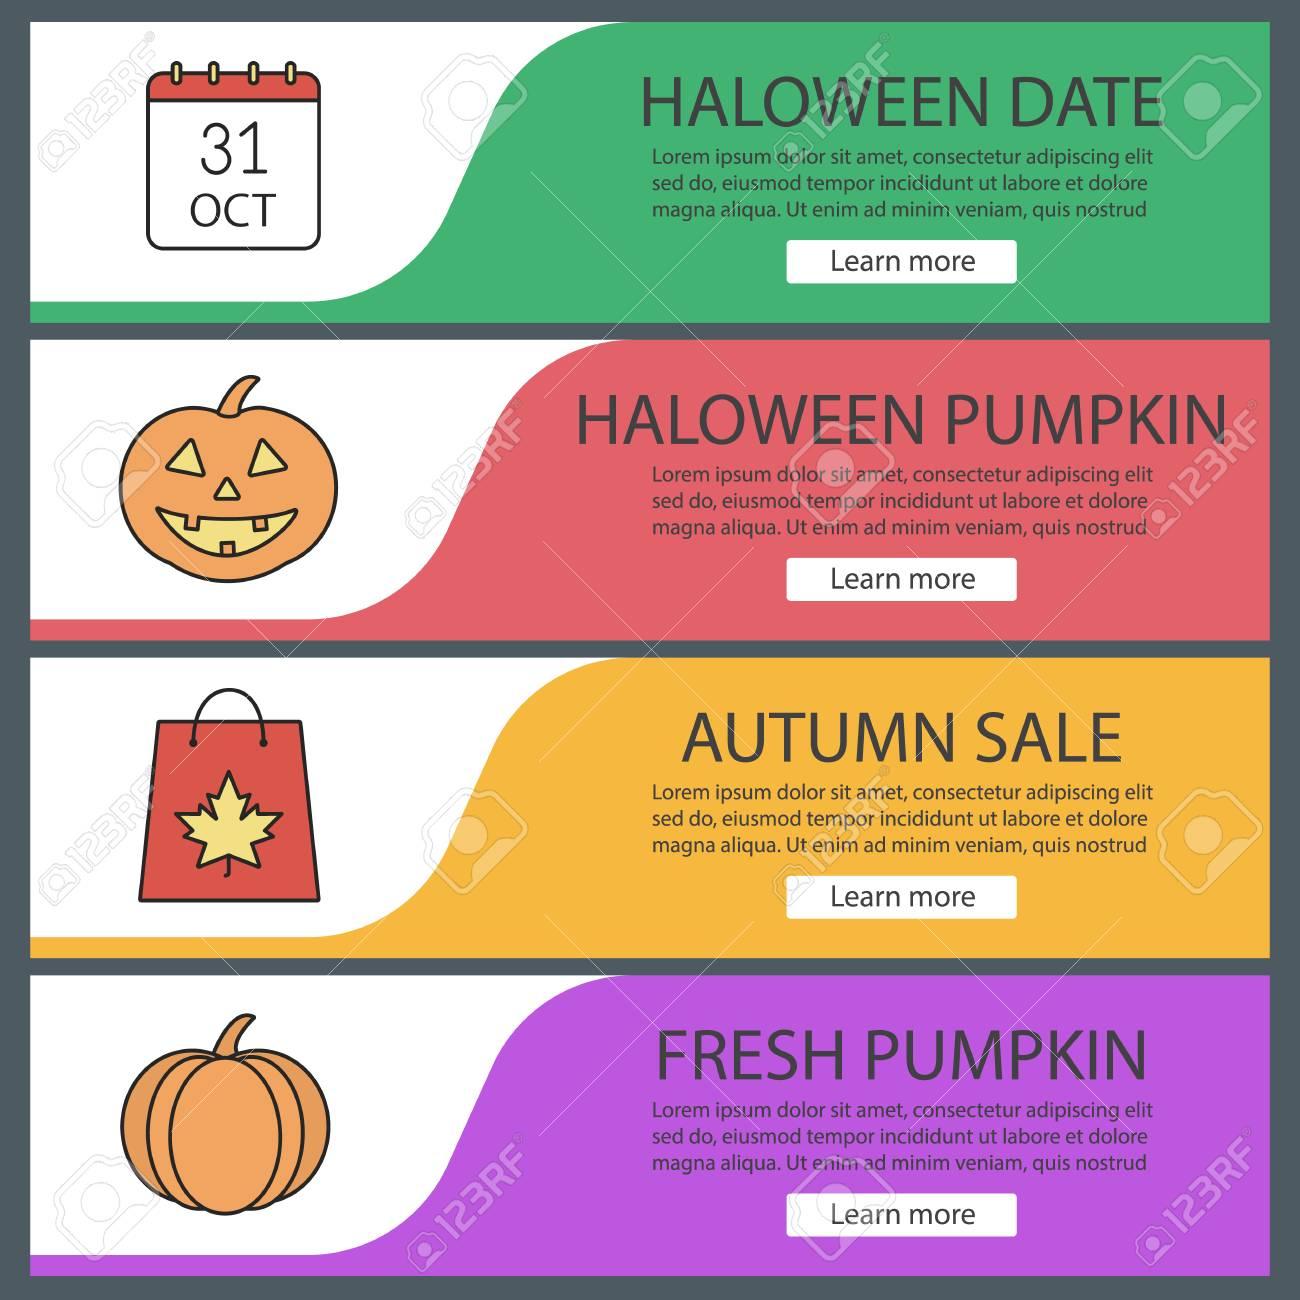 autumn season web banner templates set october 31 date halloween